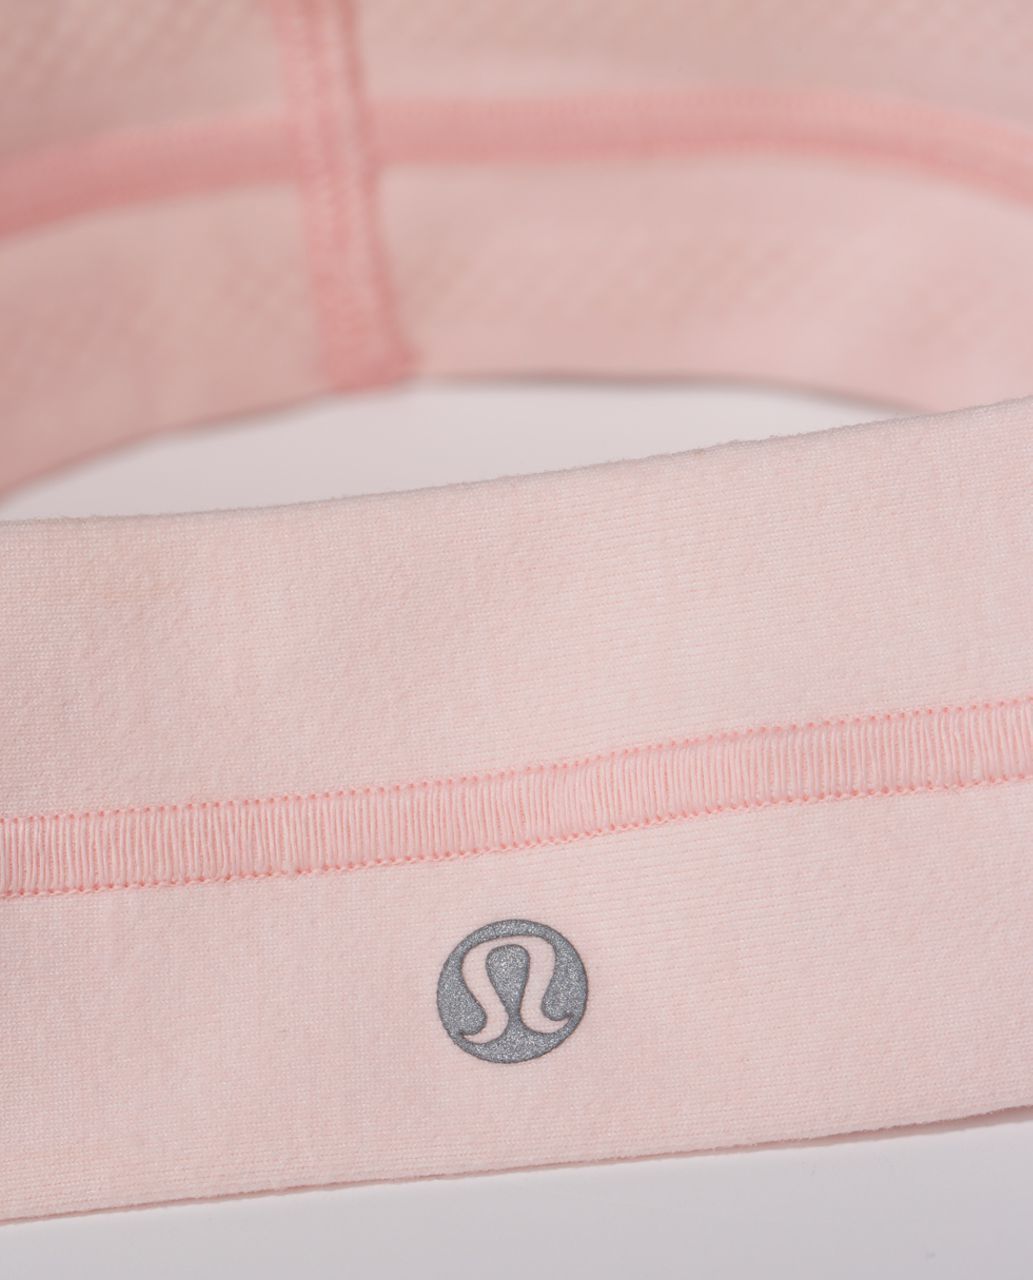 Lululemon Fly Away Tamer Headband - Heathered Parfait Pink